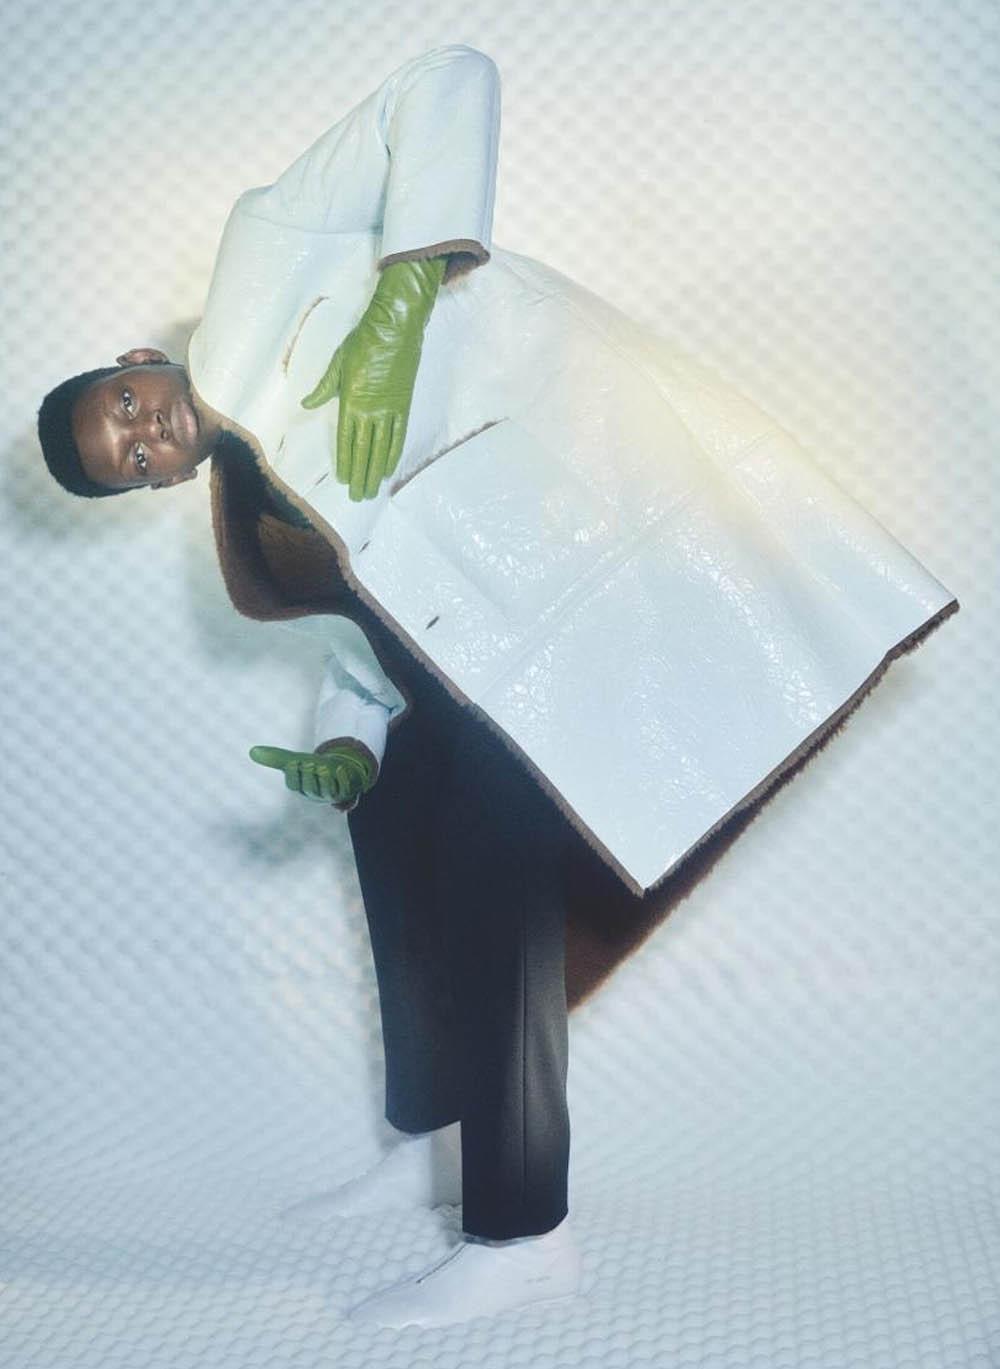 Junior Pereira by Romain Duquesne for Wallpaper* Magazine September 2020